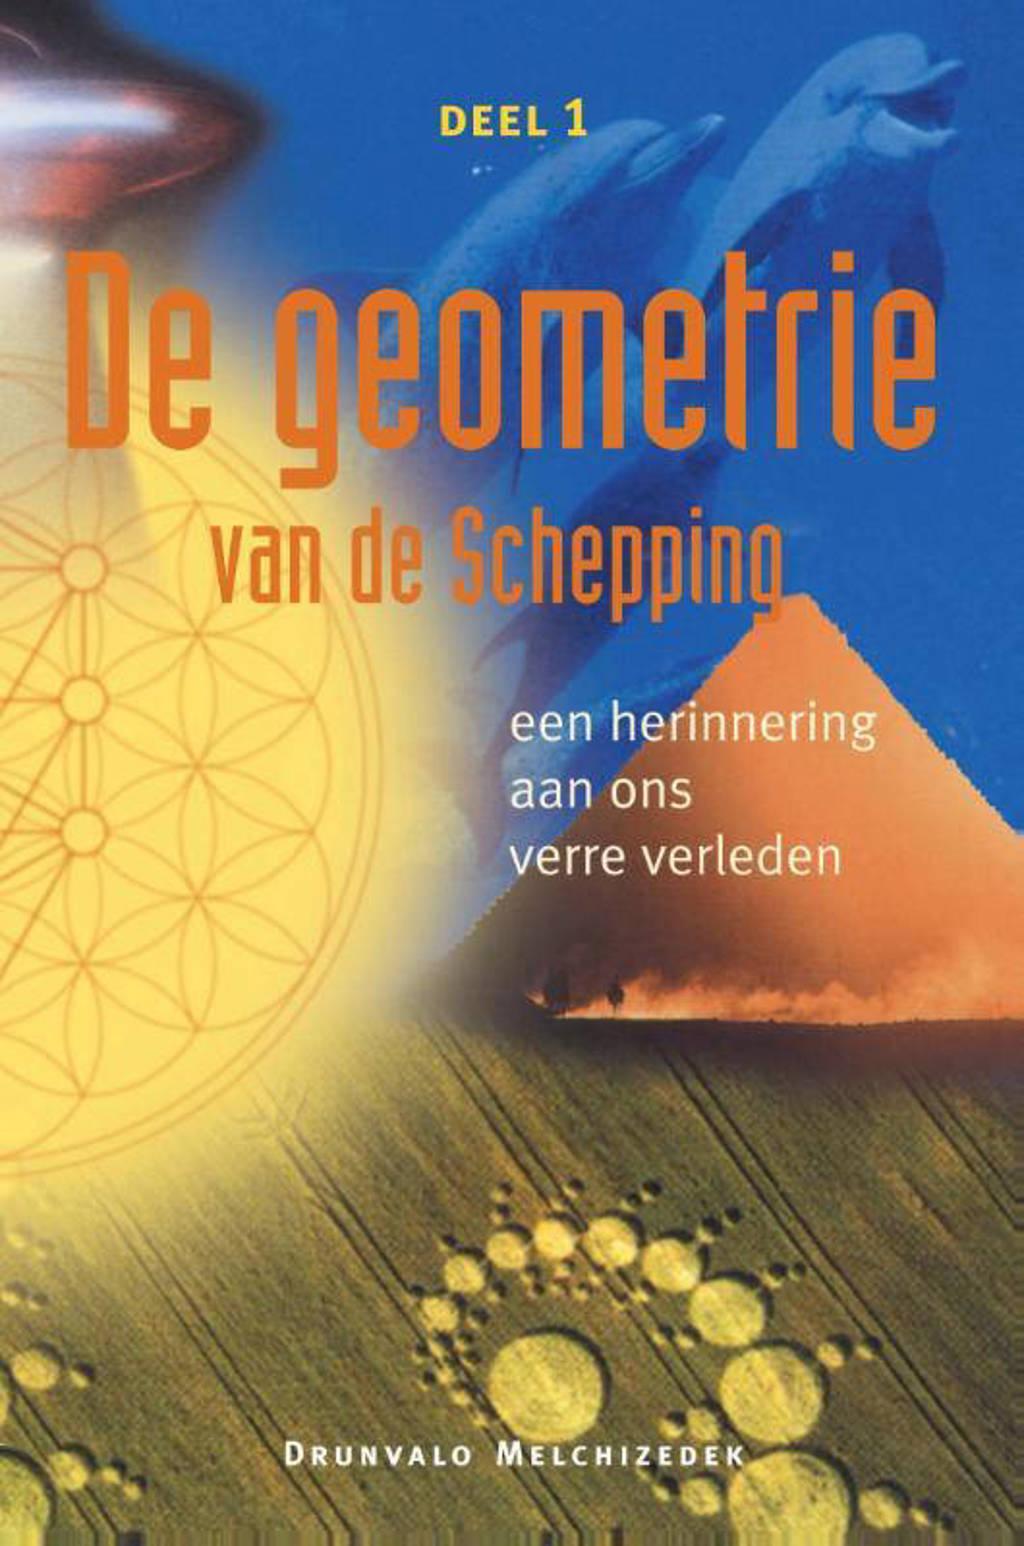 De geometrie van de Schepping - Drunvalo Melchizedek